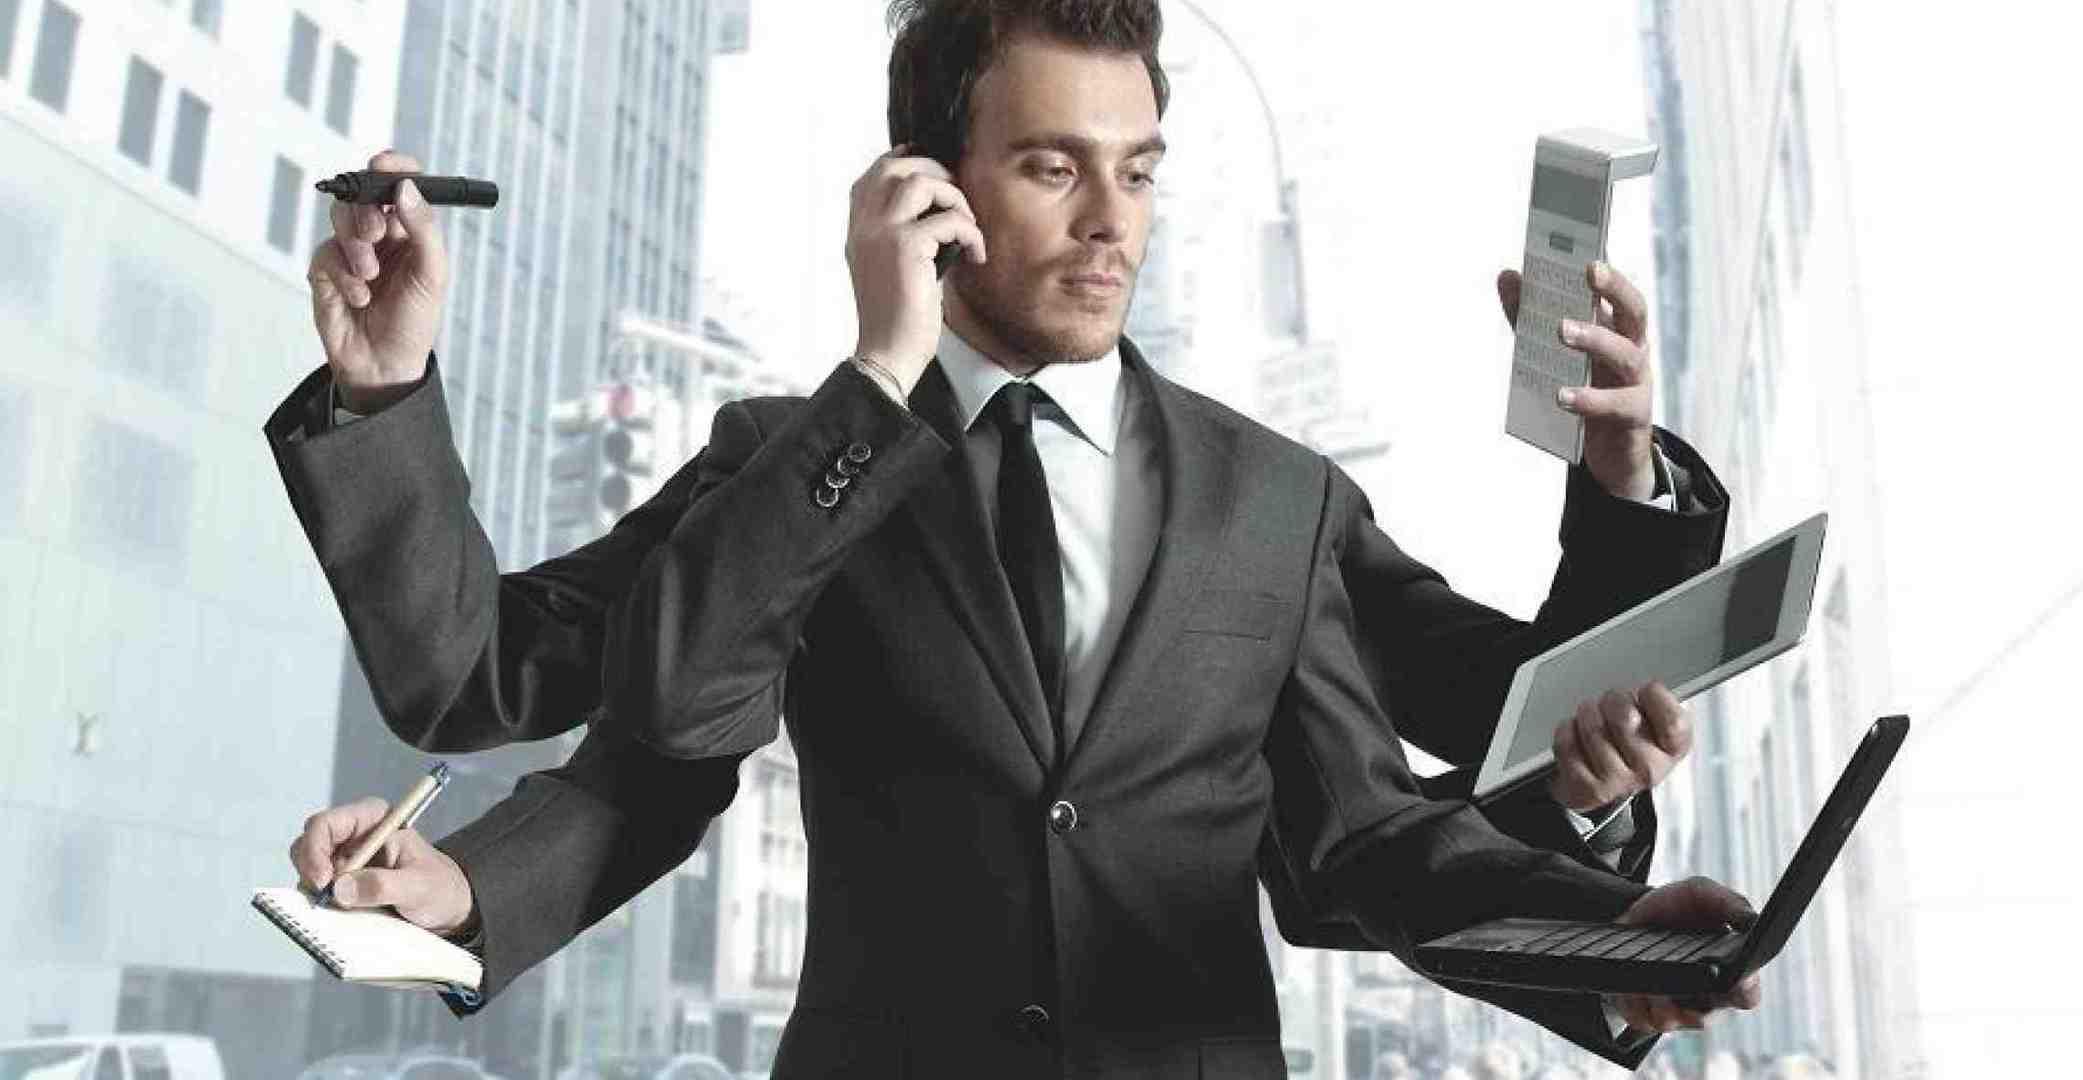 Мужчина с множеством рук и телефонами